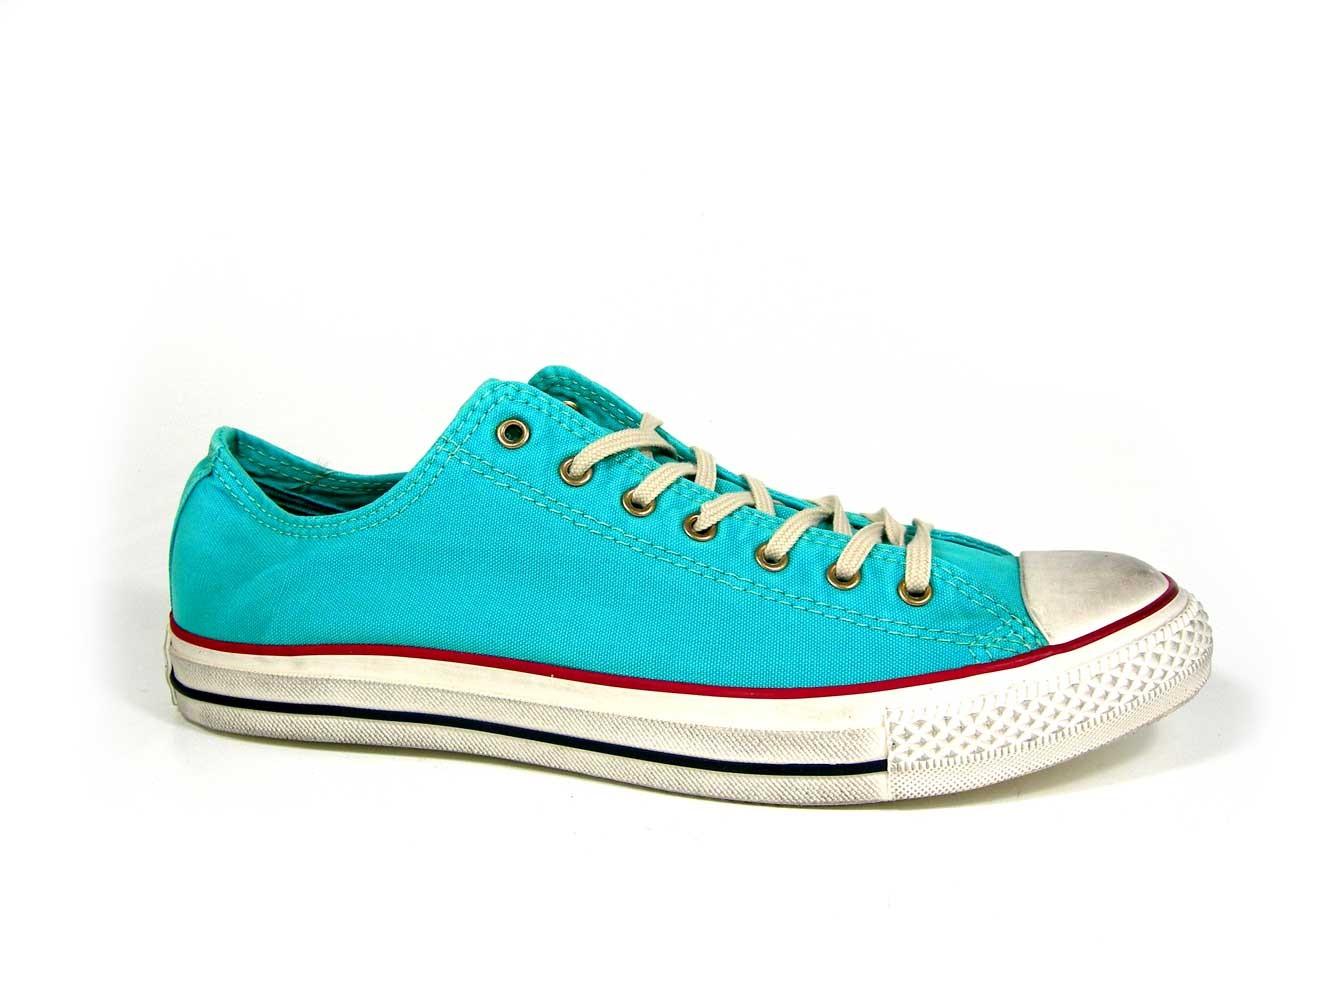 5122503c761 Converse All Star laag dames grote maat schoenen